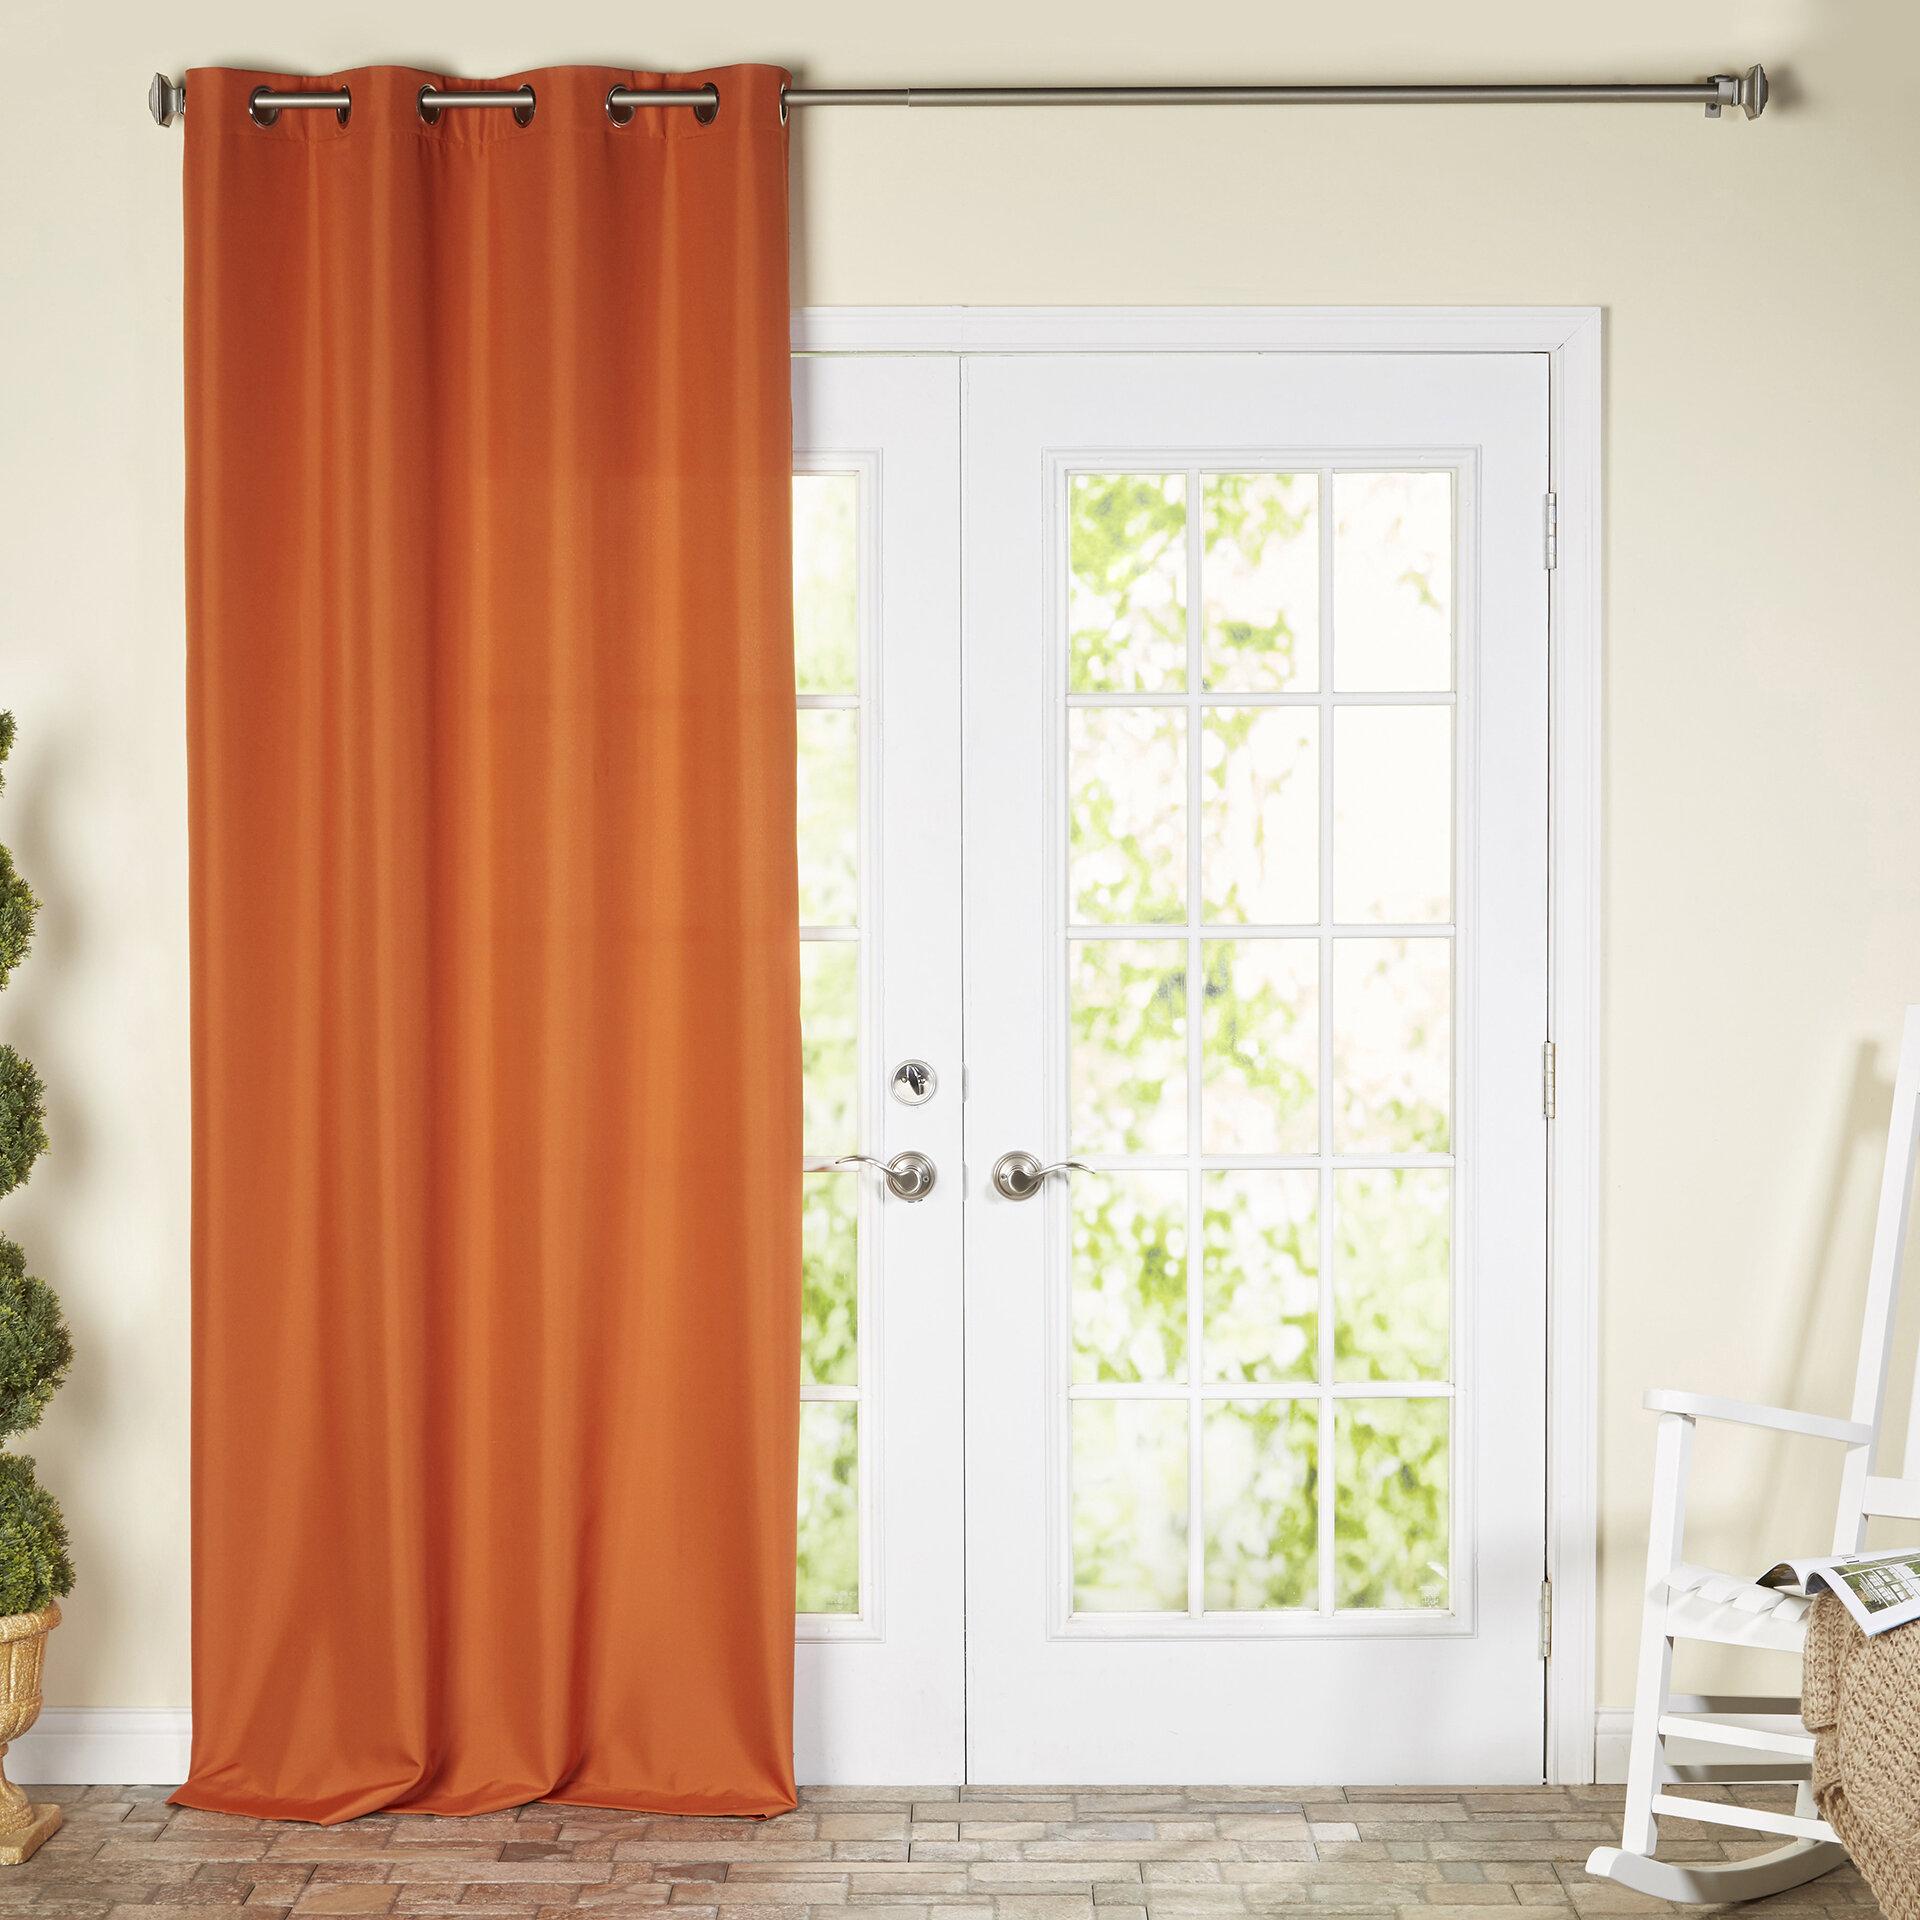 Ponce De Leon Solid Color Room Darkening Outdoor Grommet Single Curtain Panel Regarding Kaylee Solid Crushed Sheer Window Curtain Pairs (View 11 of 20)